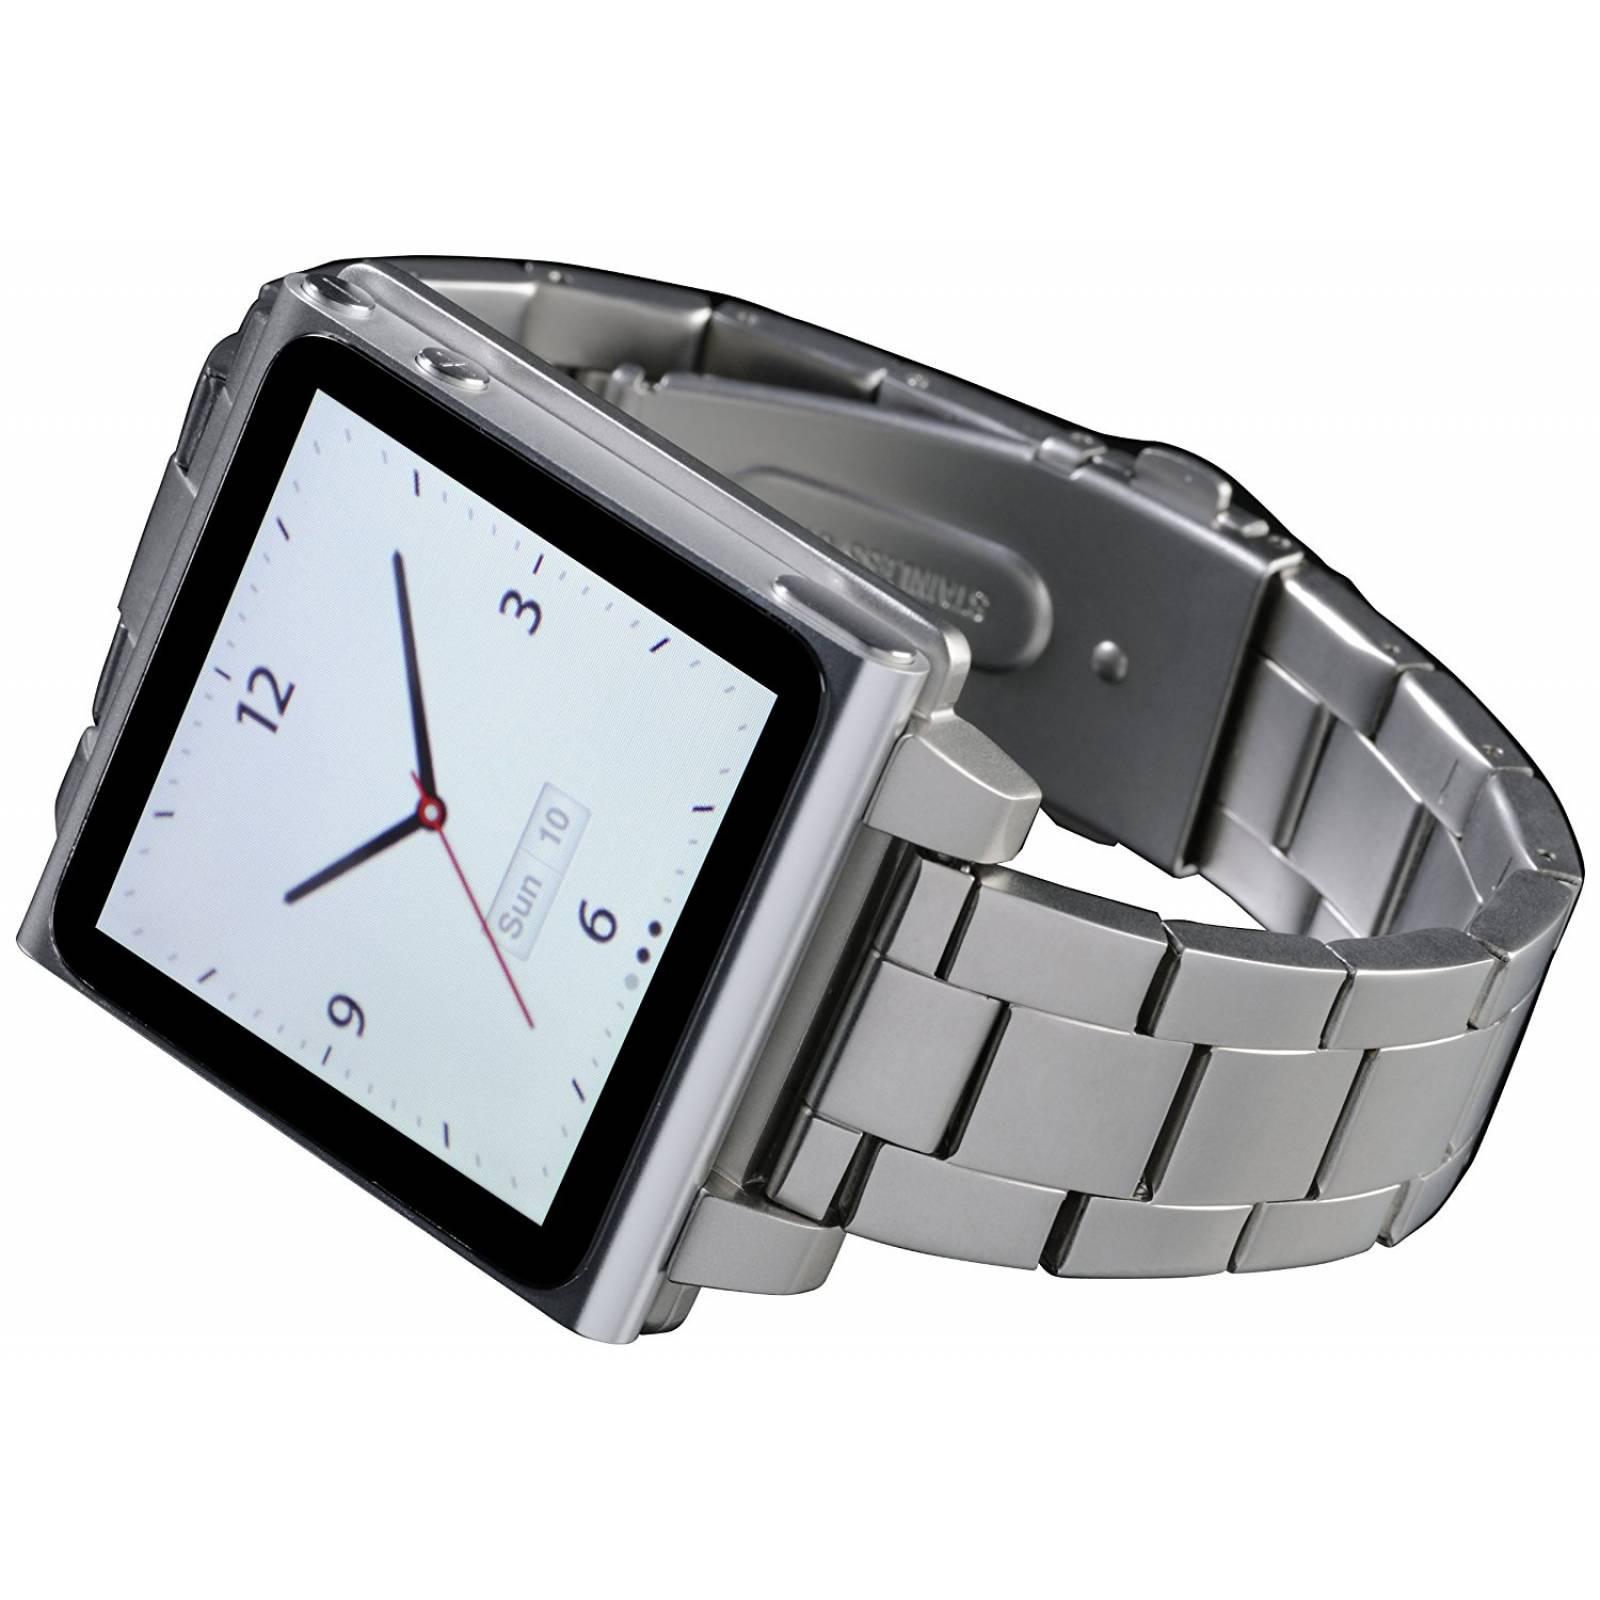 Correa Hex Tipo Reloj Para Apple Ipod Nano 6g Plateado